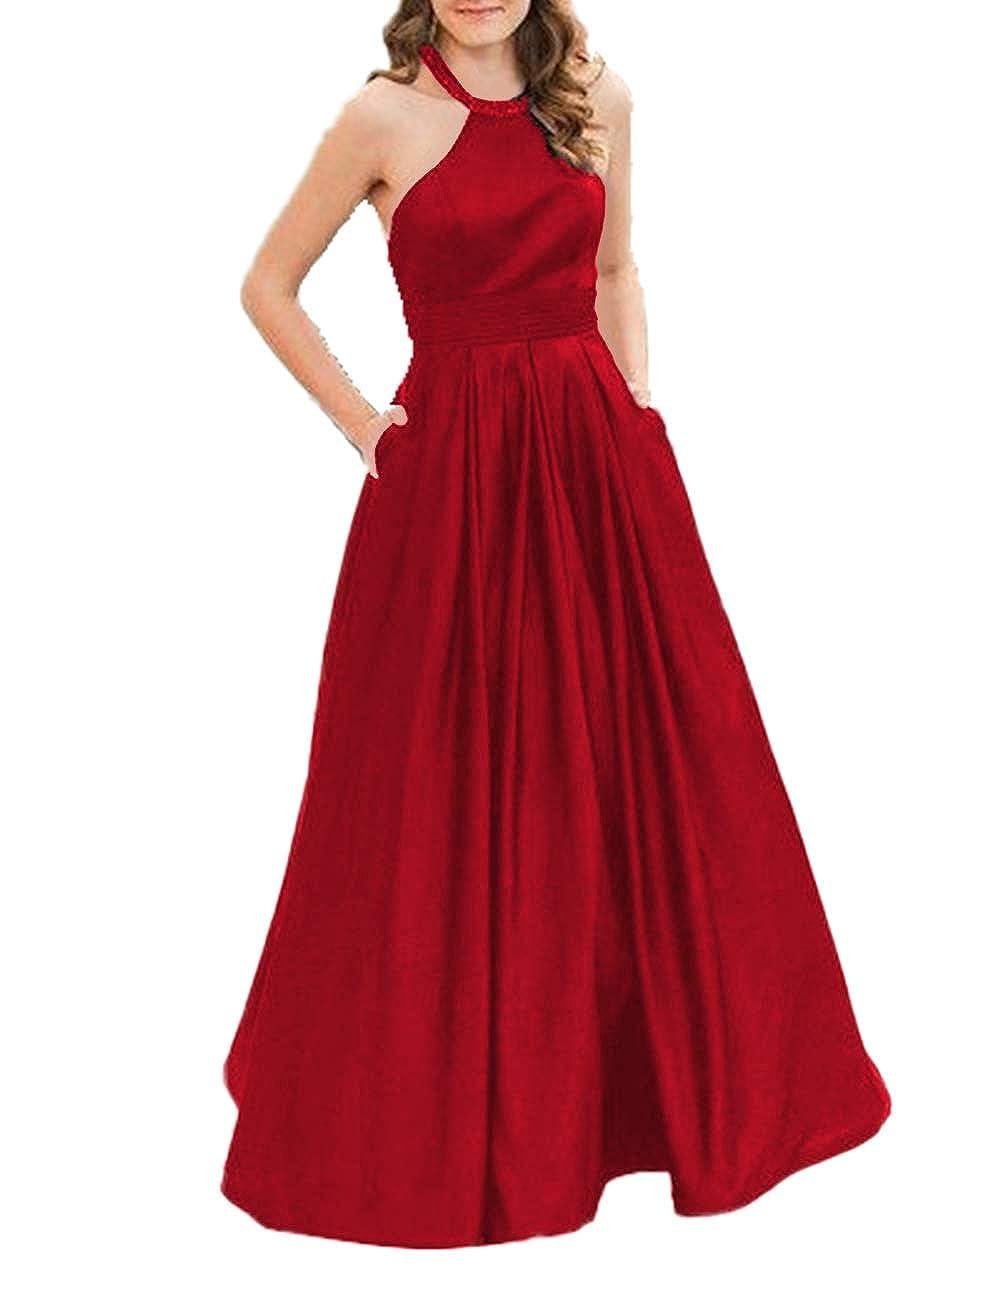 Burgundy JAEDEN Prom Dress Long Evening Dresses for Women Formal Evening Gowns Halter Prom Dress 2019